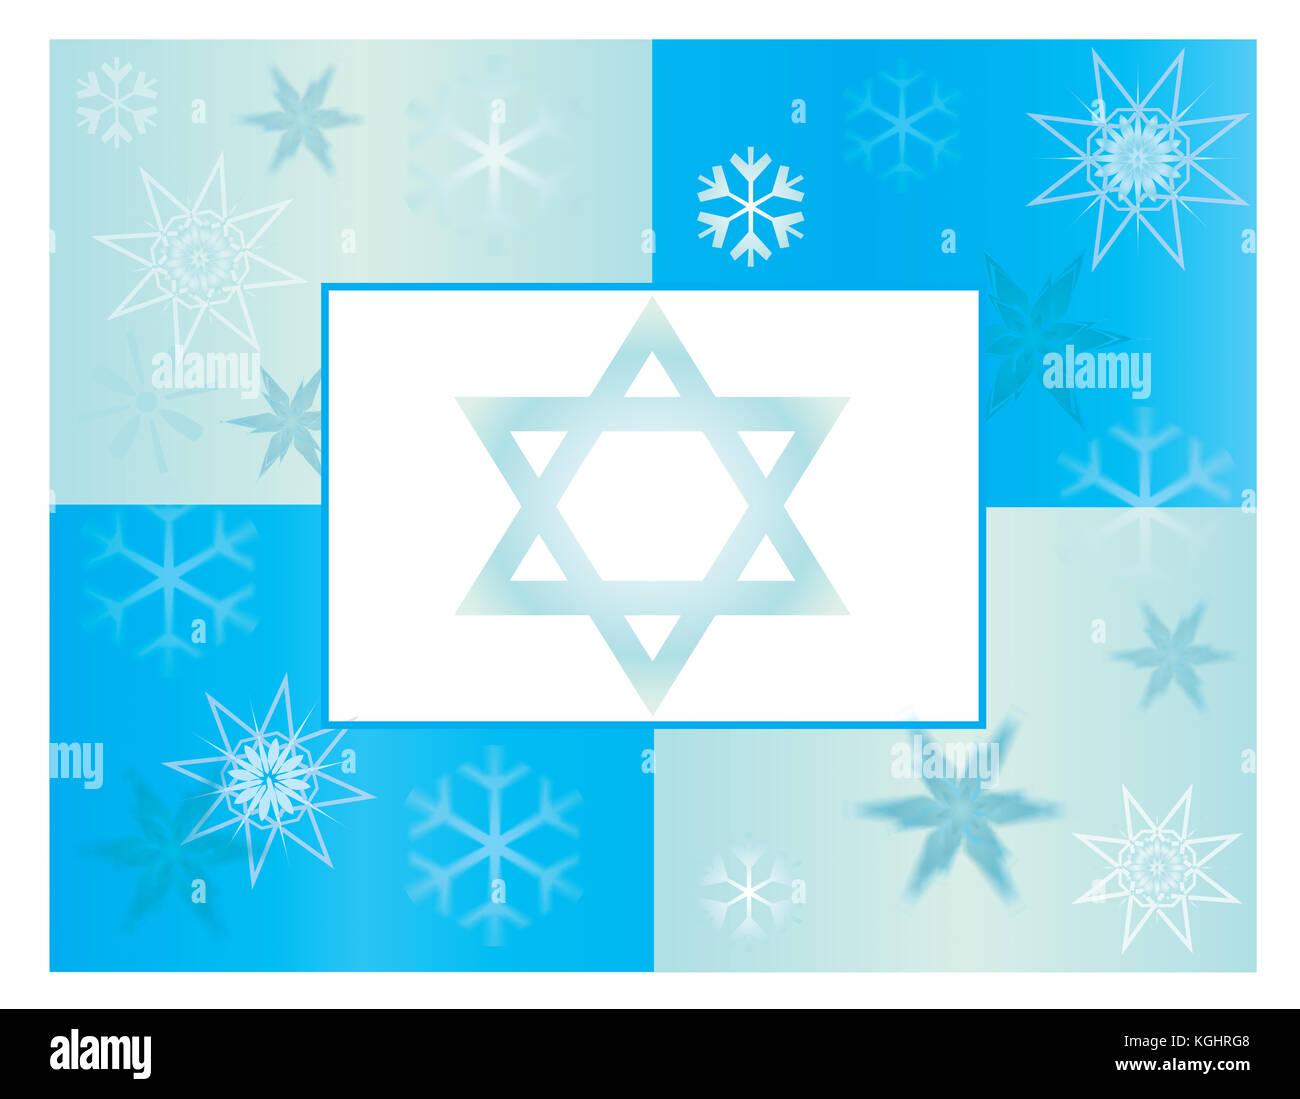 Hanukkah Card or Poster Template Stock Photo